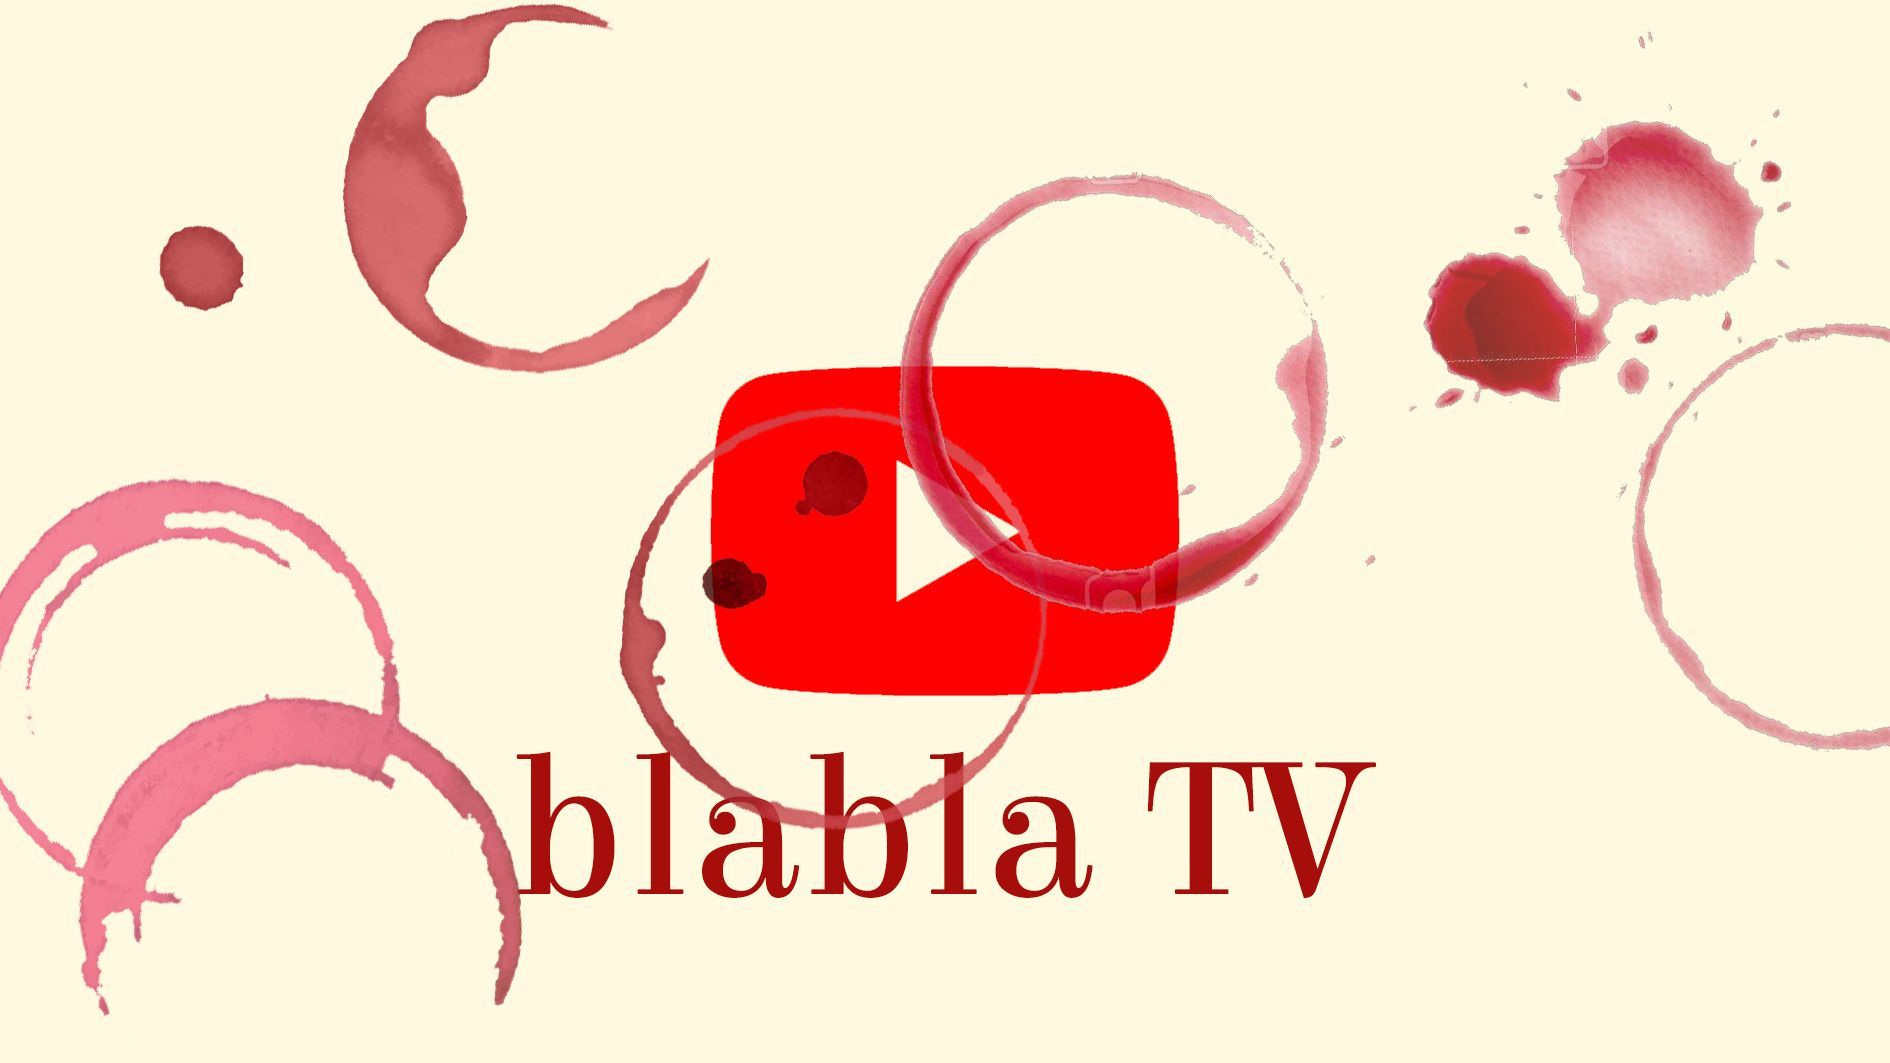 bla bla TV | myenoteca.app